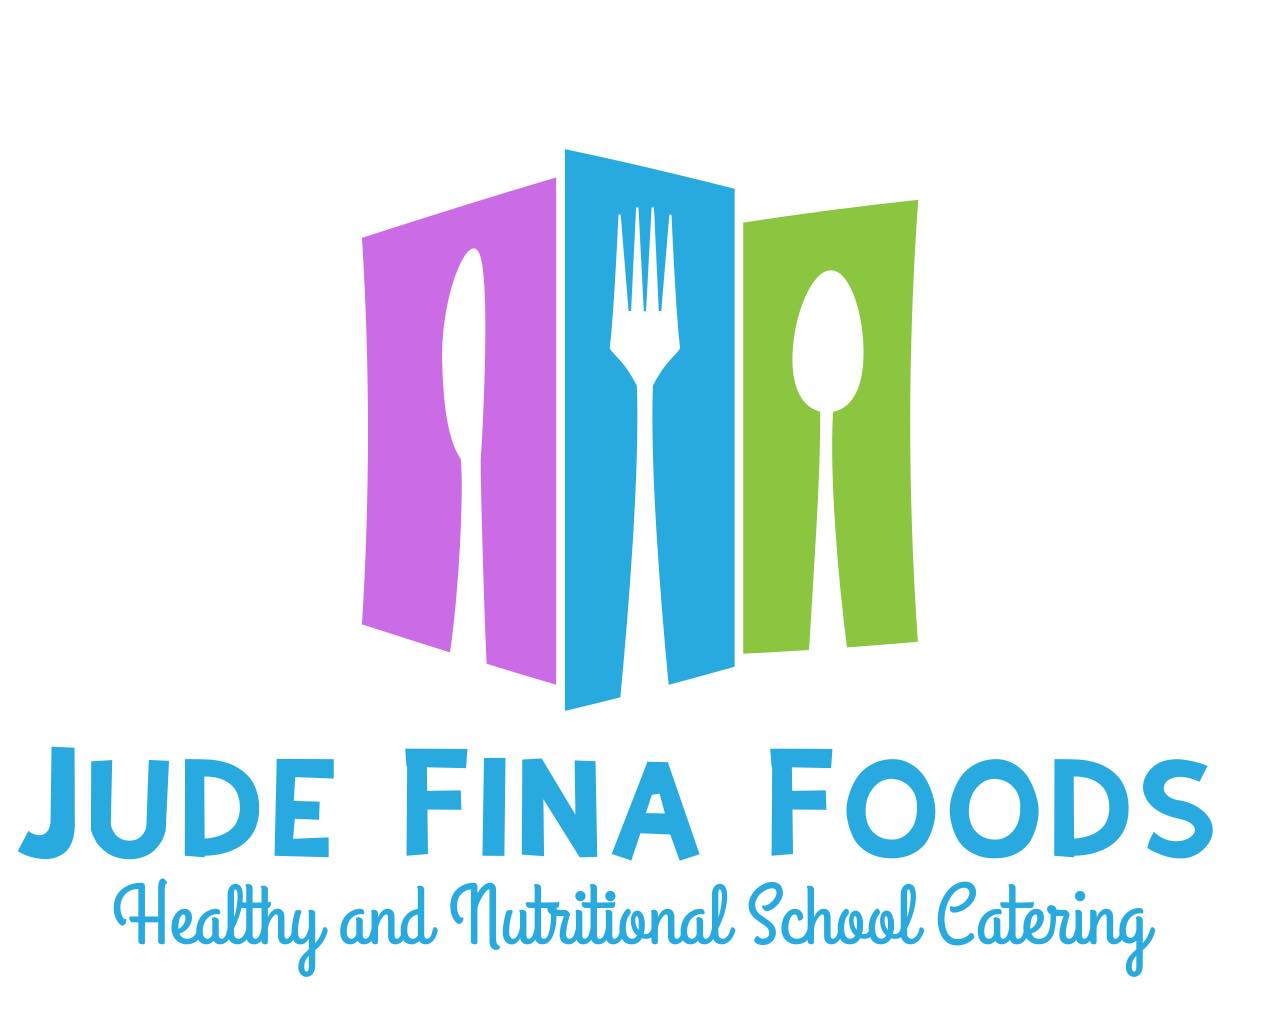 Jude Fina Foods New Logo